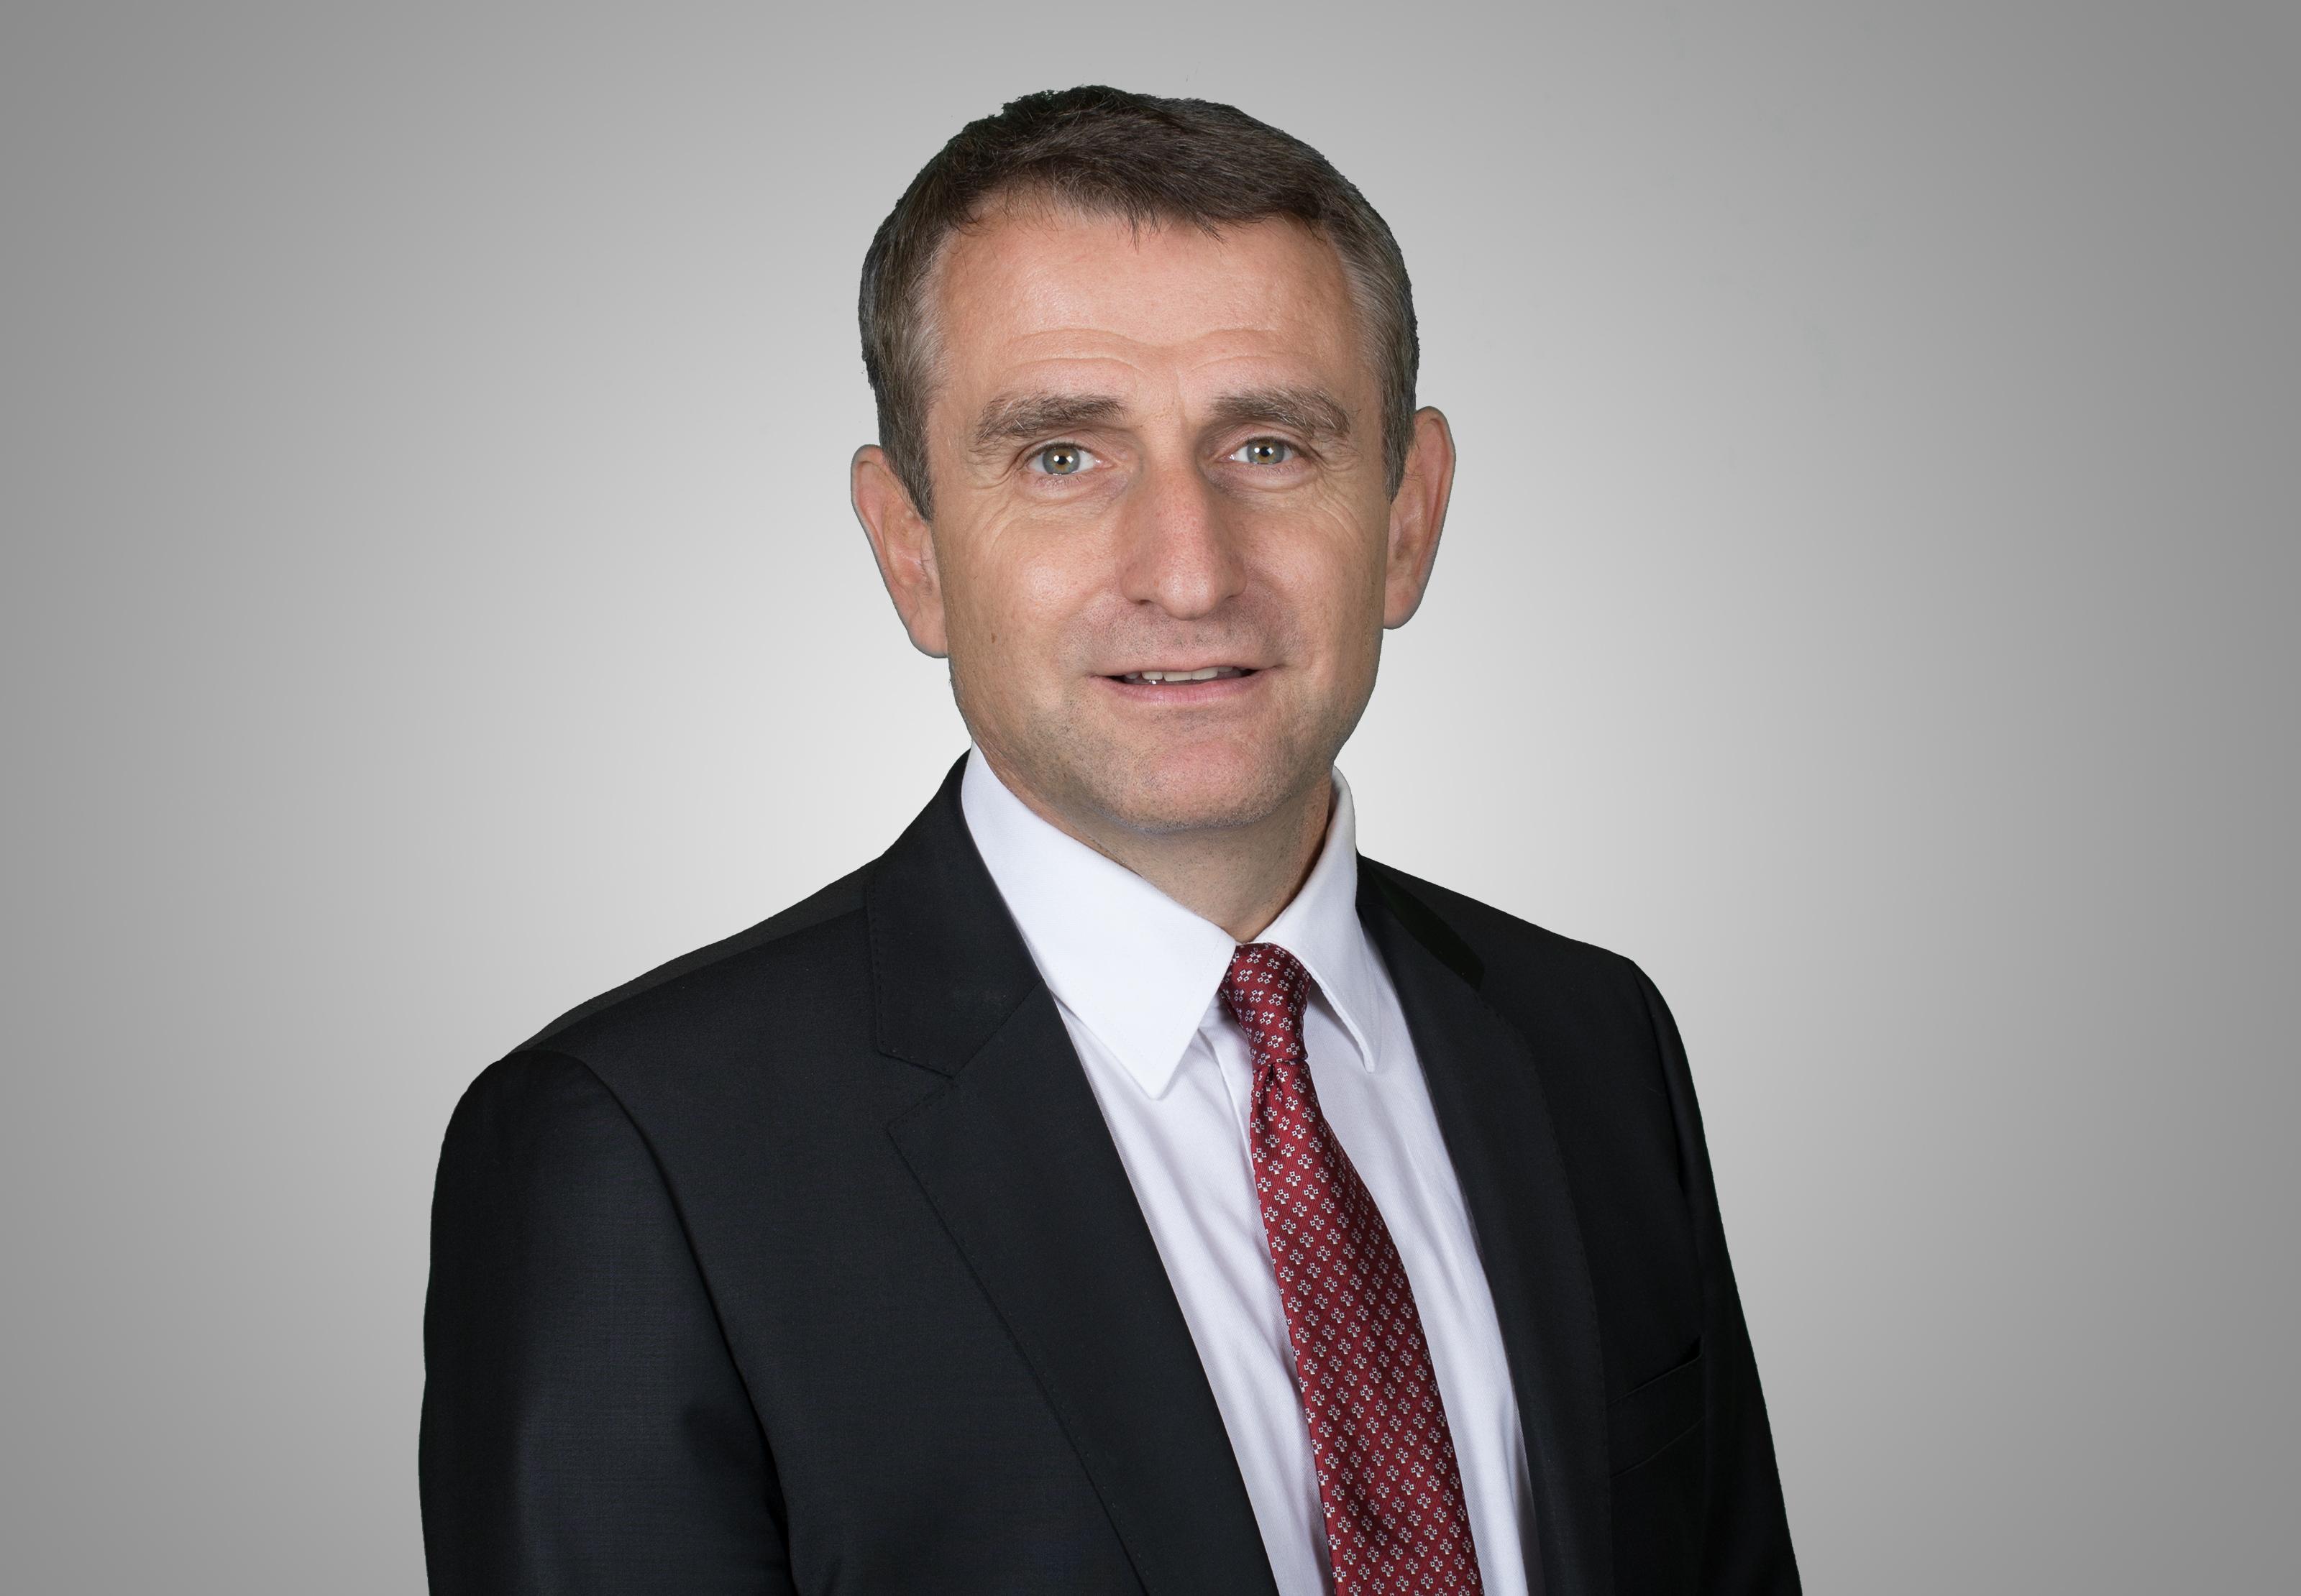 Luca Rubaga - UniCredit Bulbank on